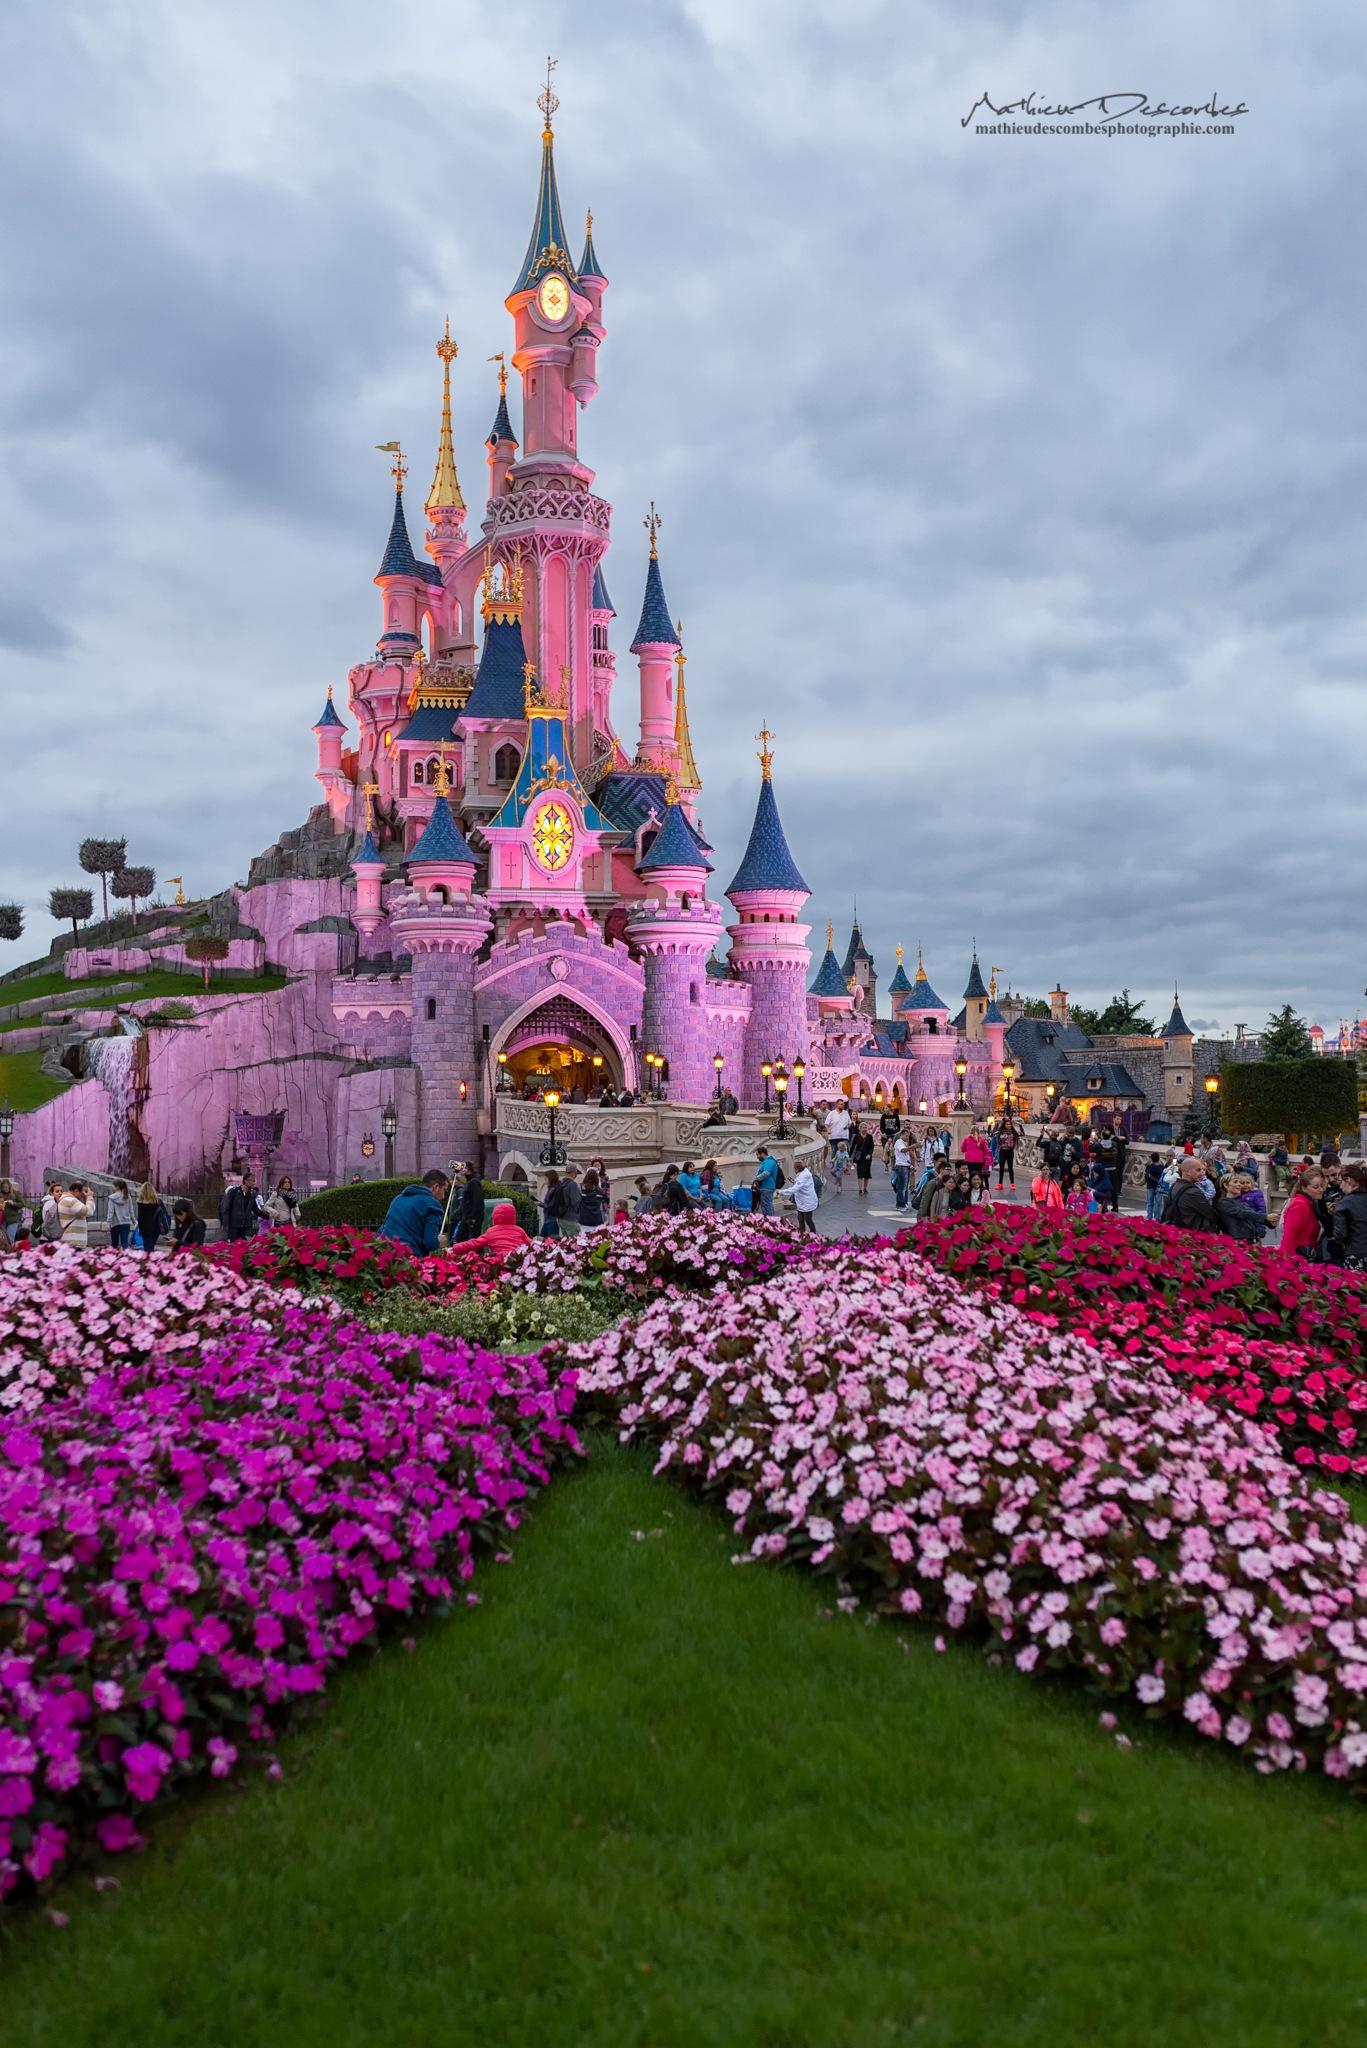 Disney by Mathieu Descombes Photographie